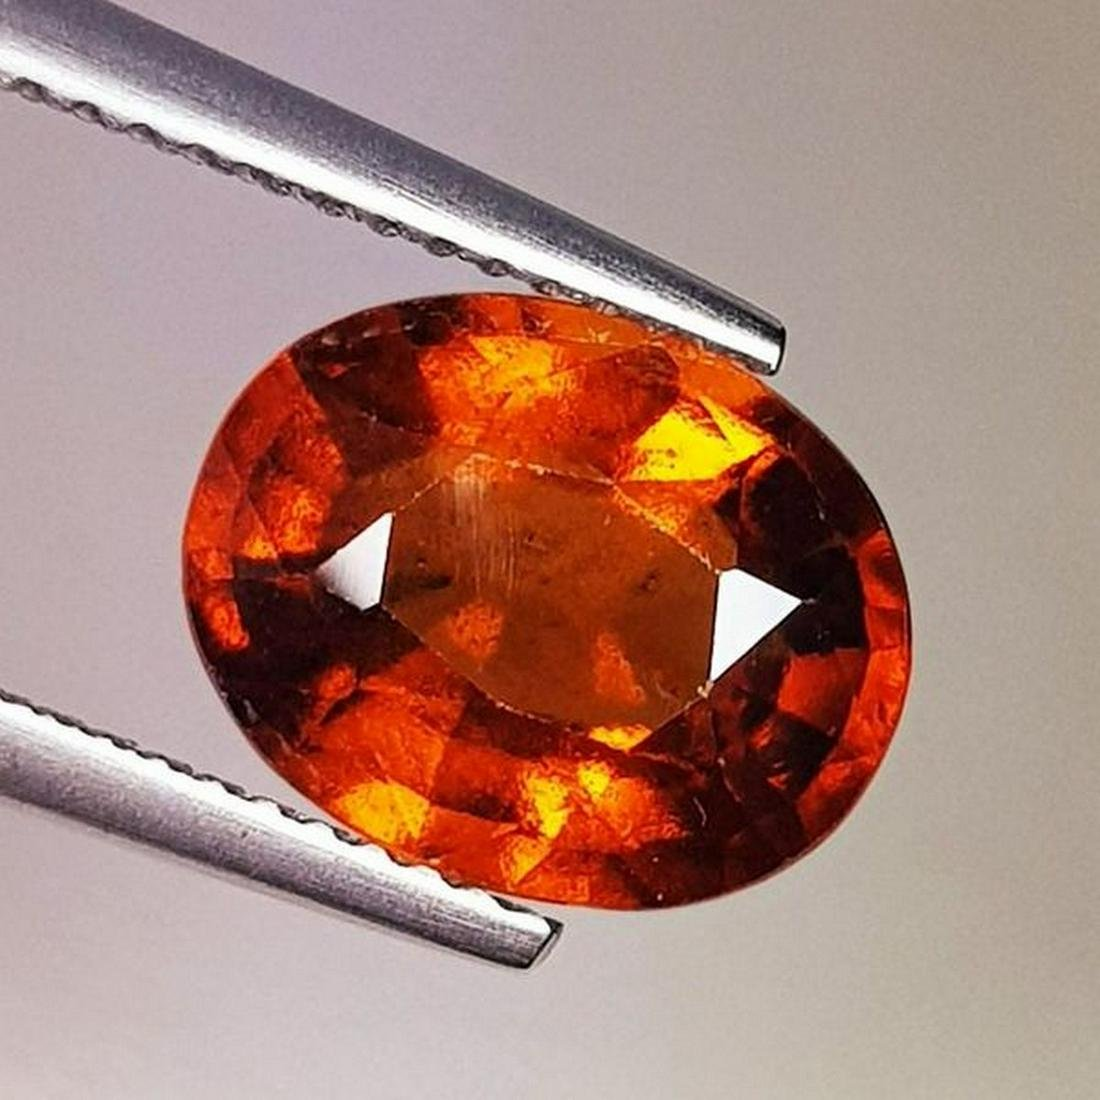 Natural Hessonite Garnet Oval Cut 4.09 ct